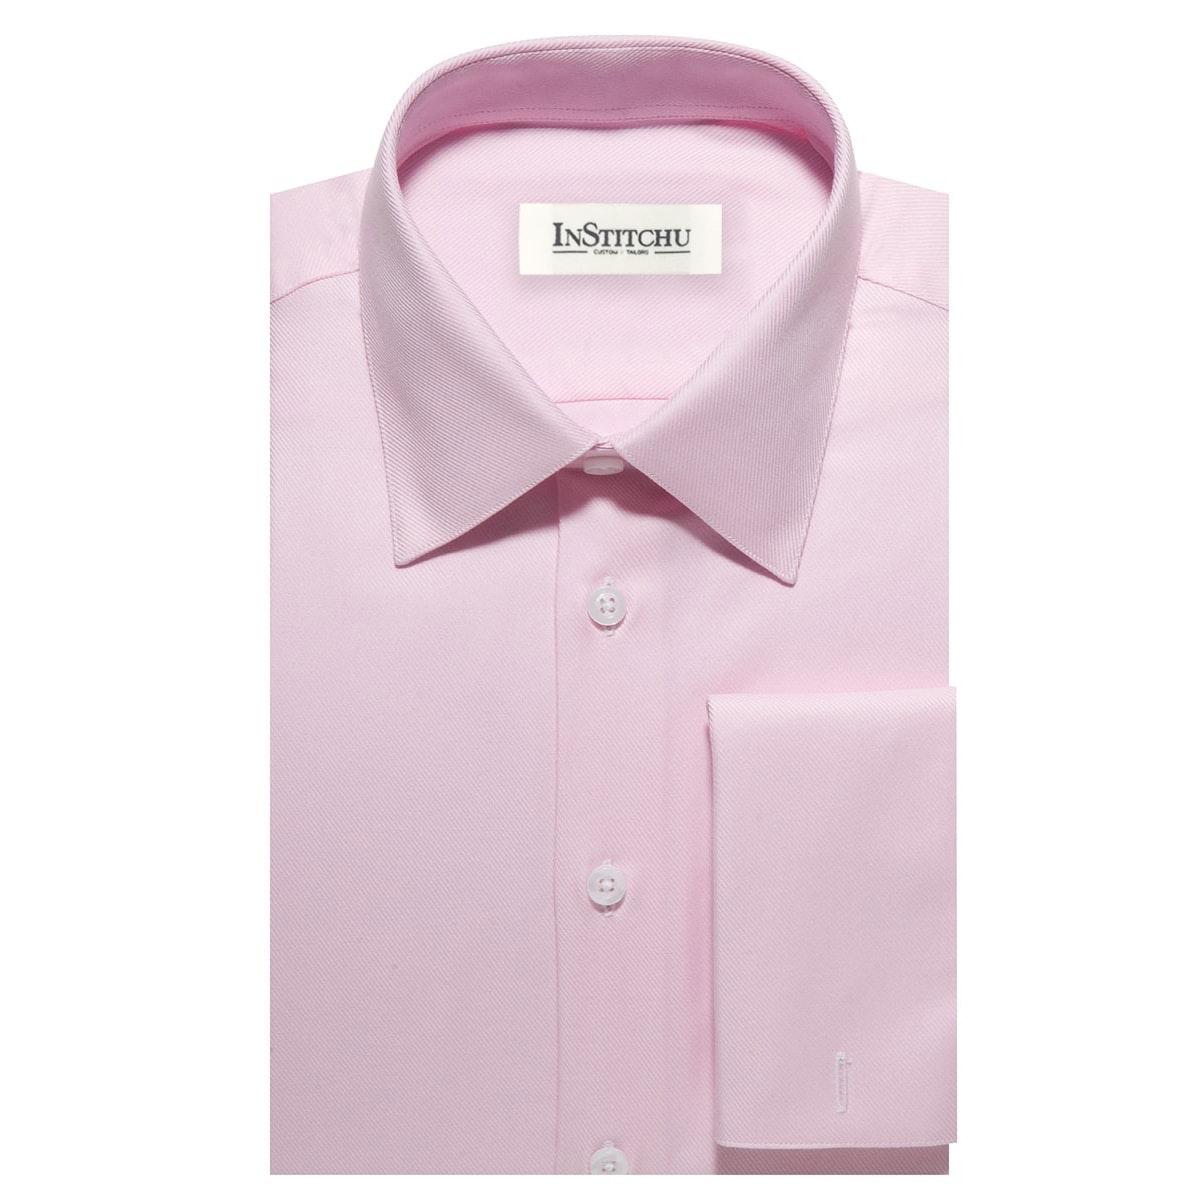 InStitchu Collection The Dadi Pink Shirt